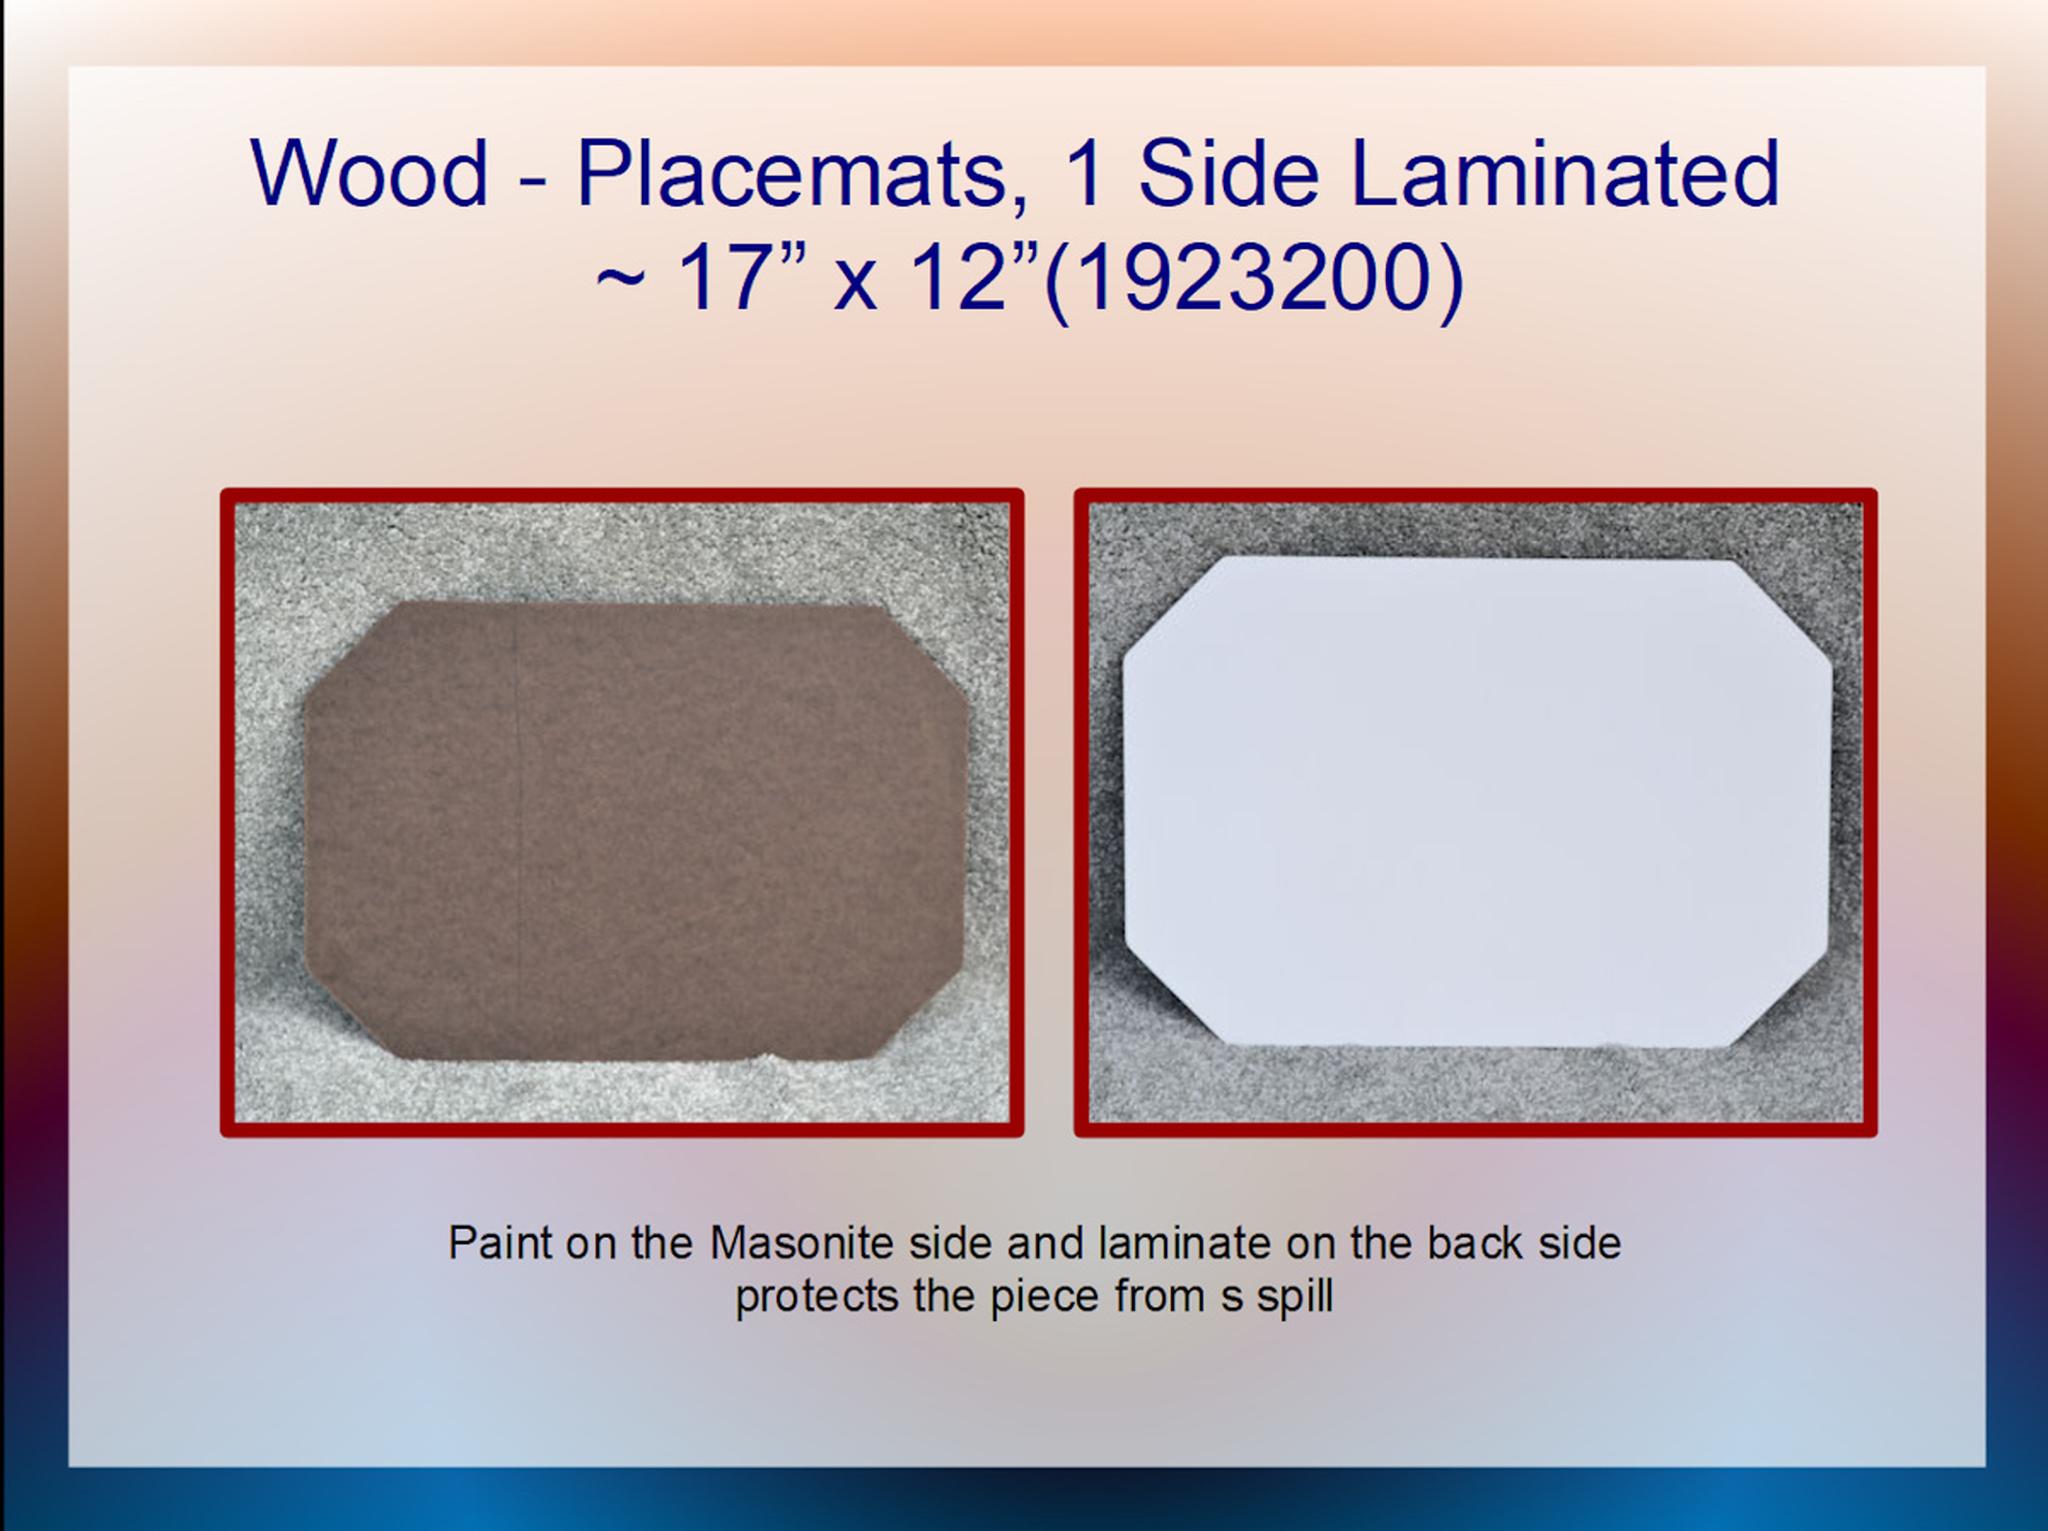 wood-masonte-laminated-1923200.jpg